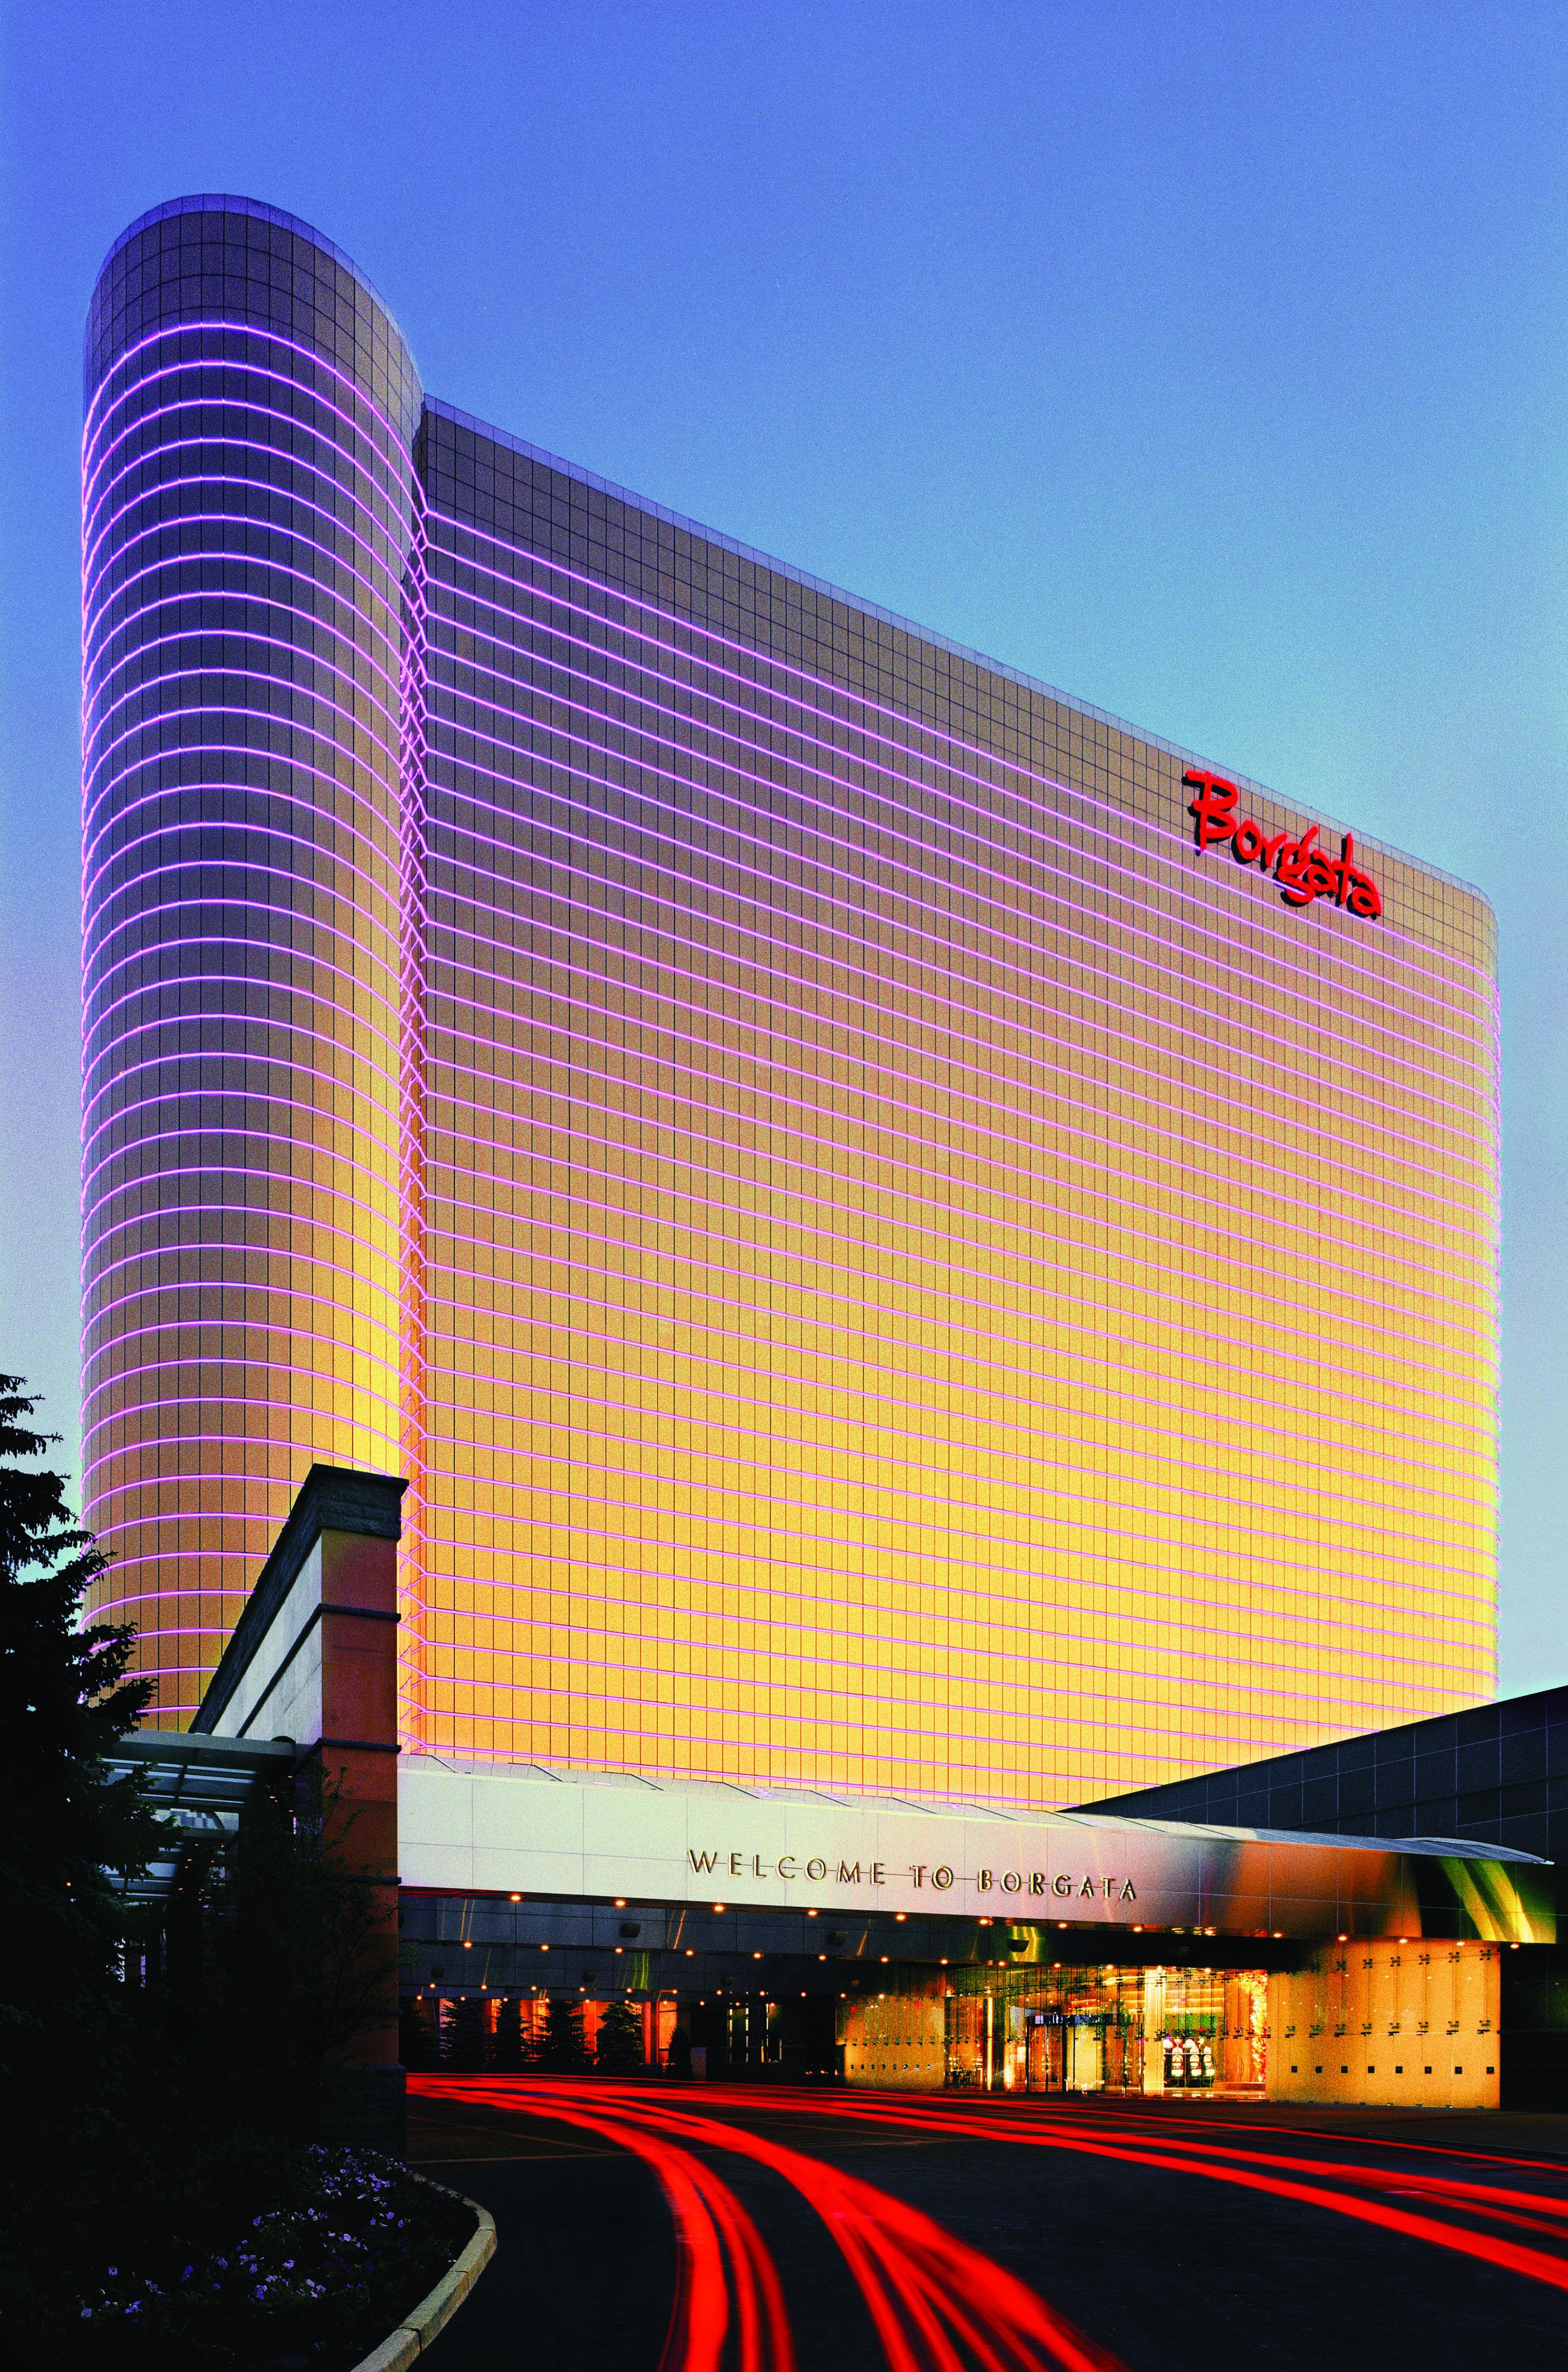 Atlantic City Hotels >> Welcome To Borgata Atlanticcity Hotel Casino Spa Client